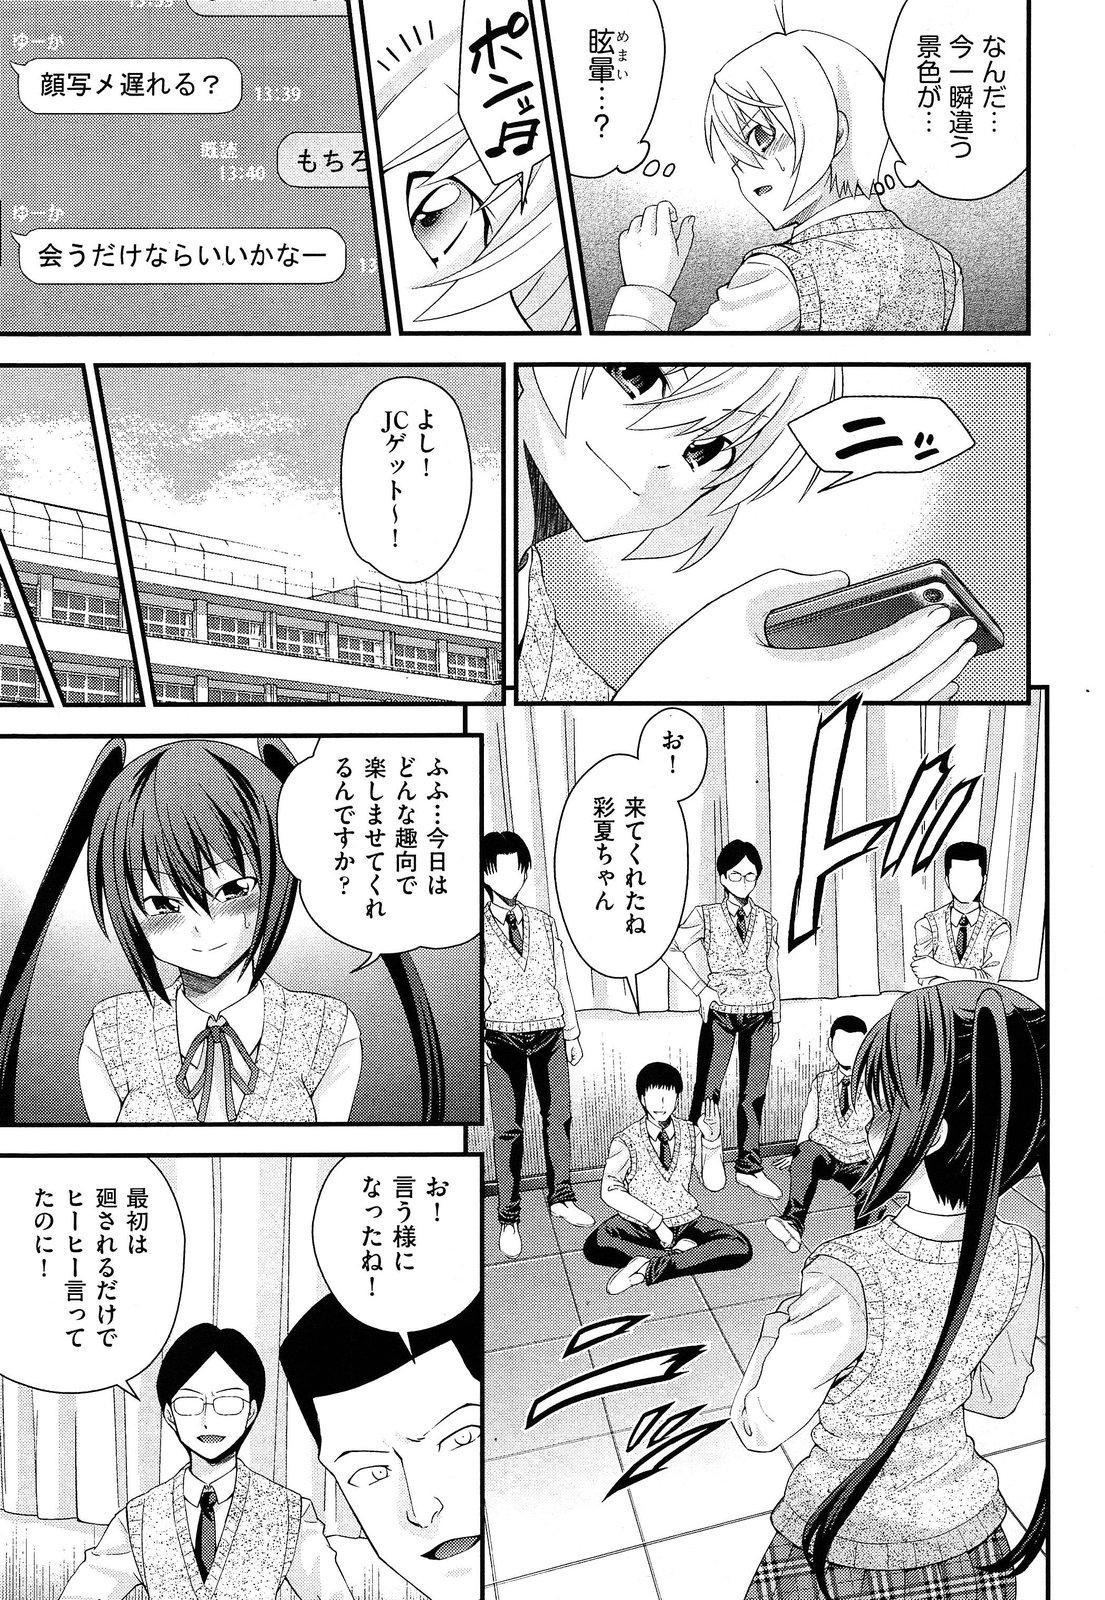 Kyoudai Replace 100